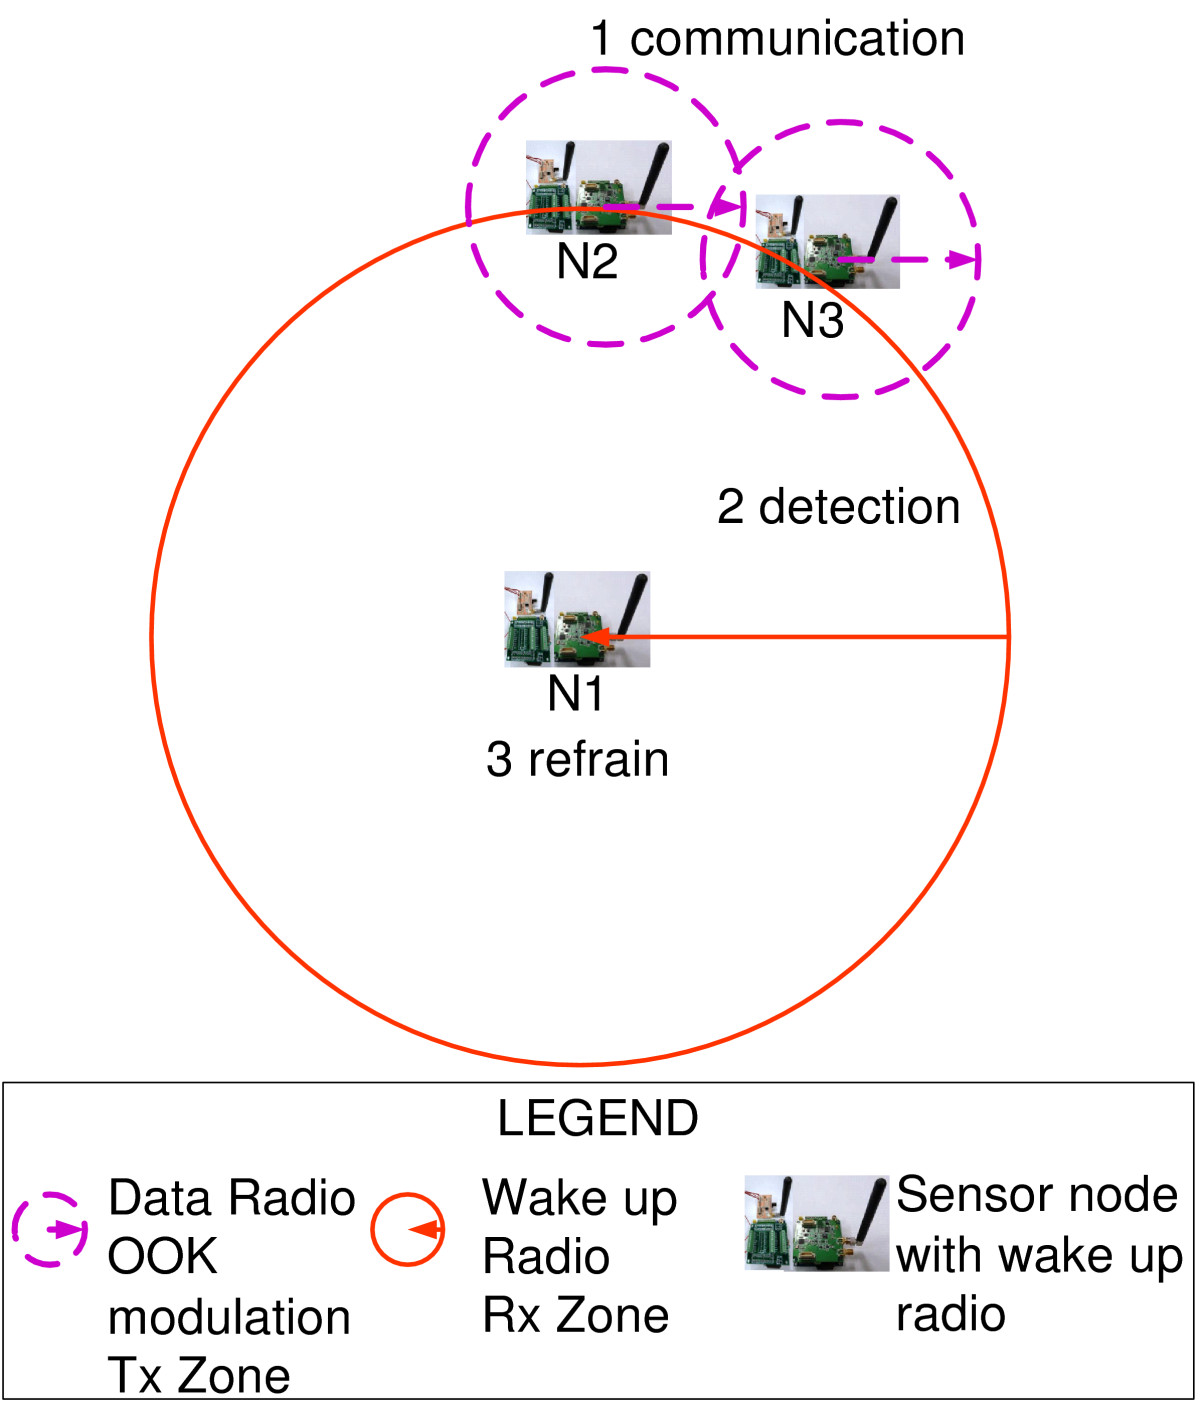 High Sensitivity Wake Up Radio Using Spreading Codes Design Alarm 5 Zone Circuit Cmos Ic Open Image In New Window